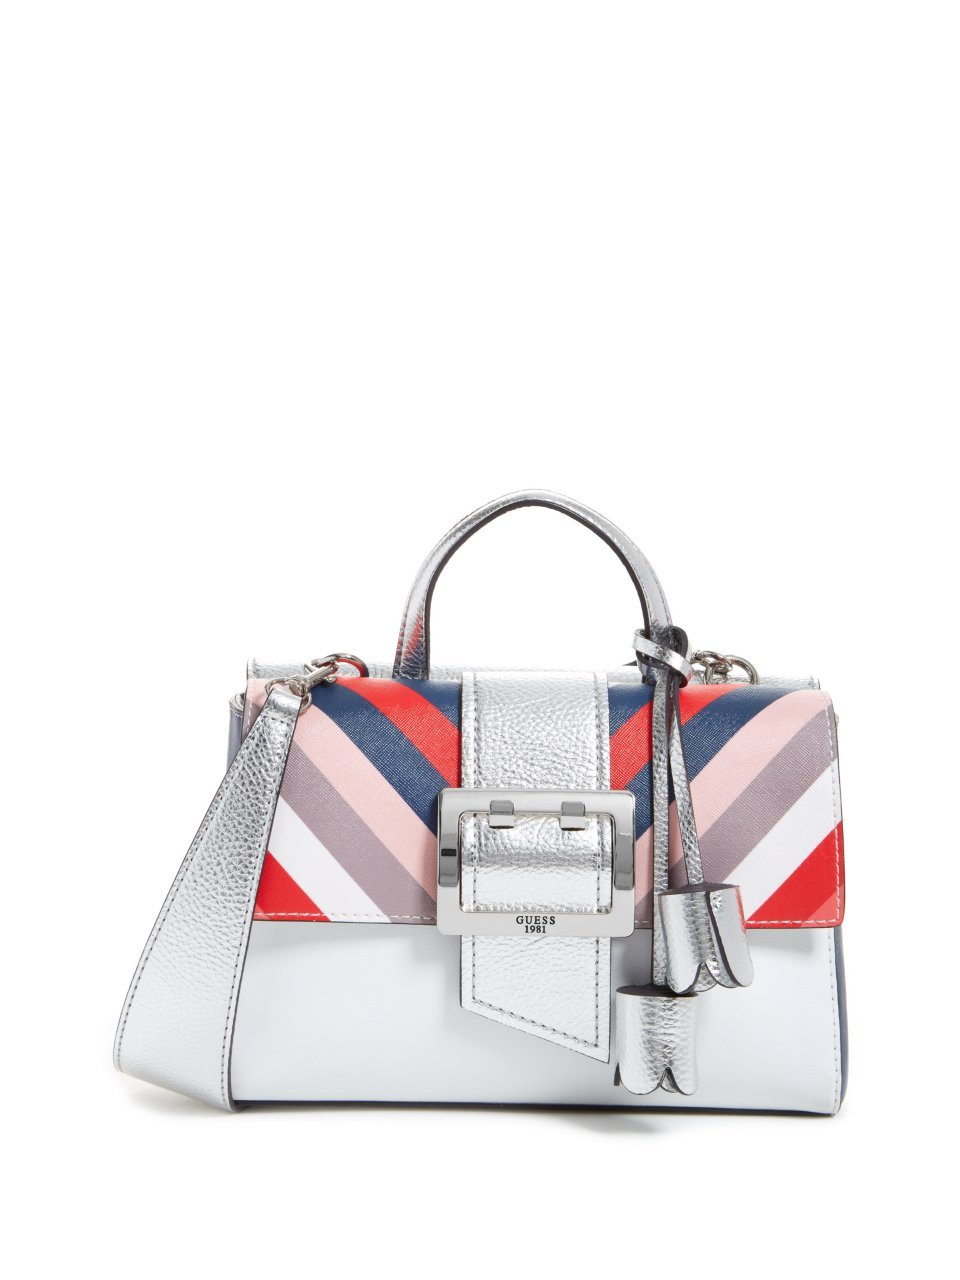 GUESS Tori Metallic Shoulder Bag